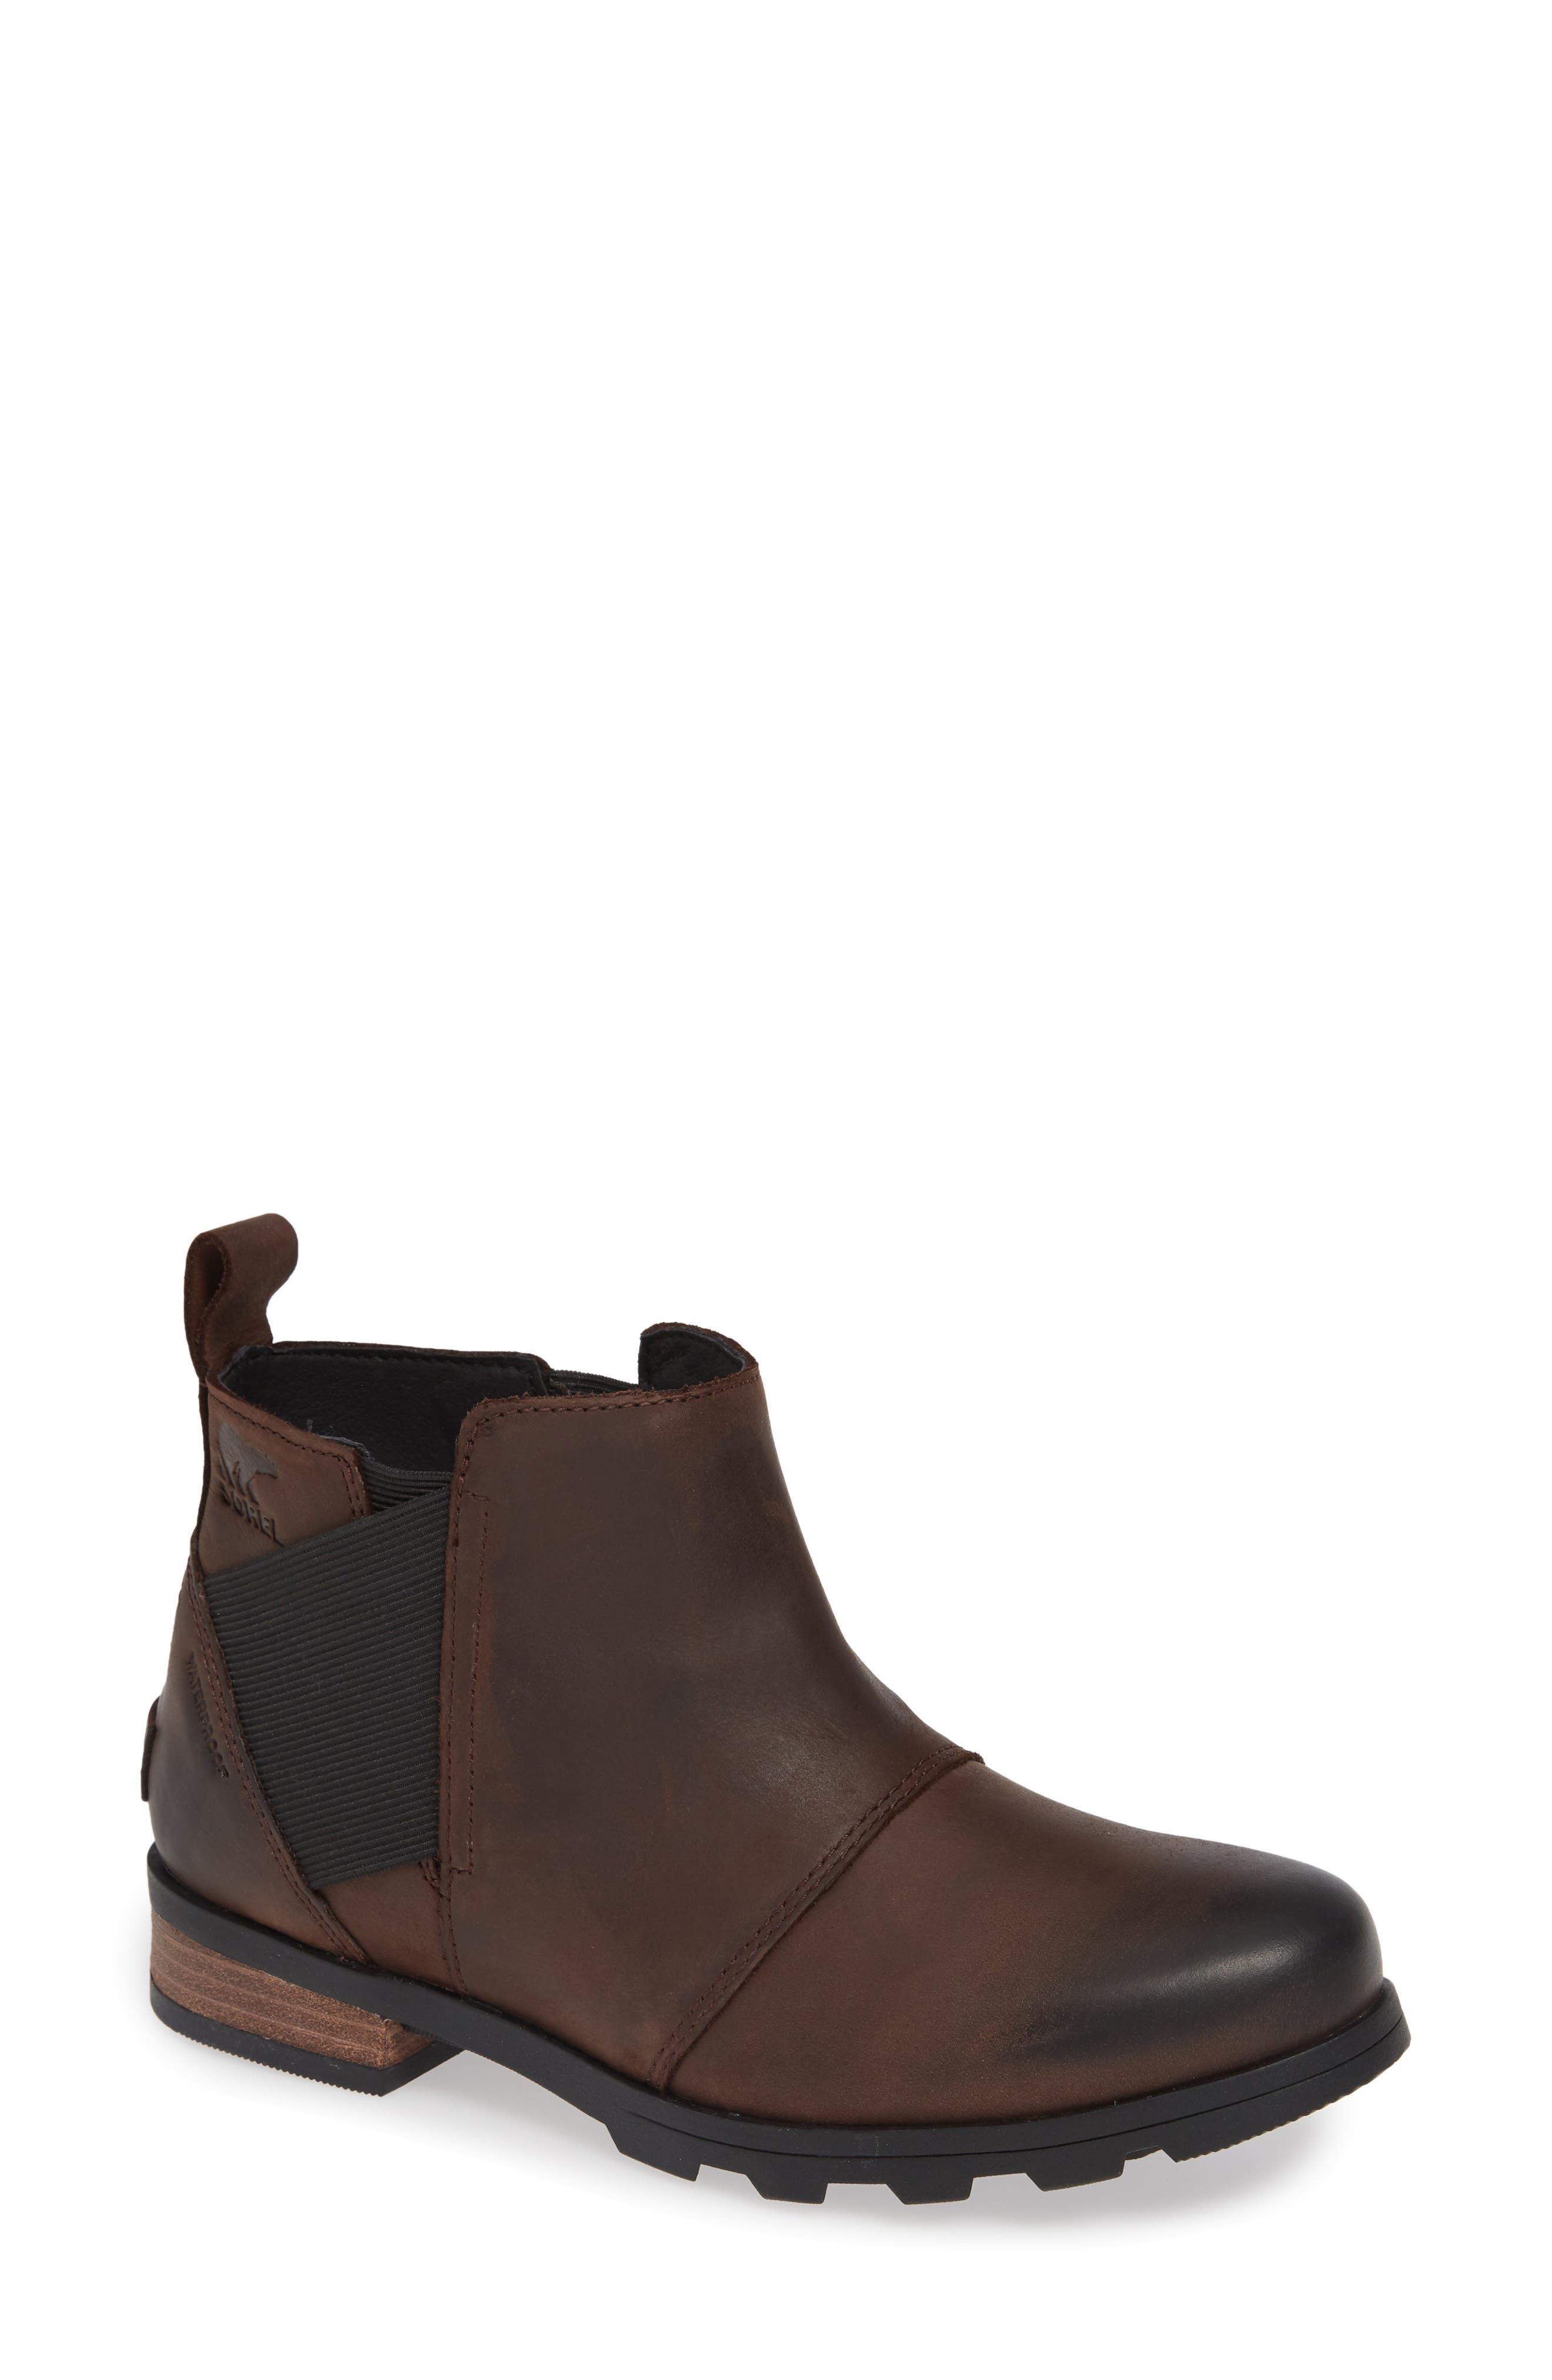 Emelie Waterproof Chelsea Boot,                             Main thumbnail 2, color,